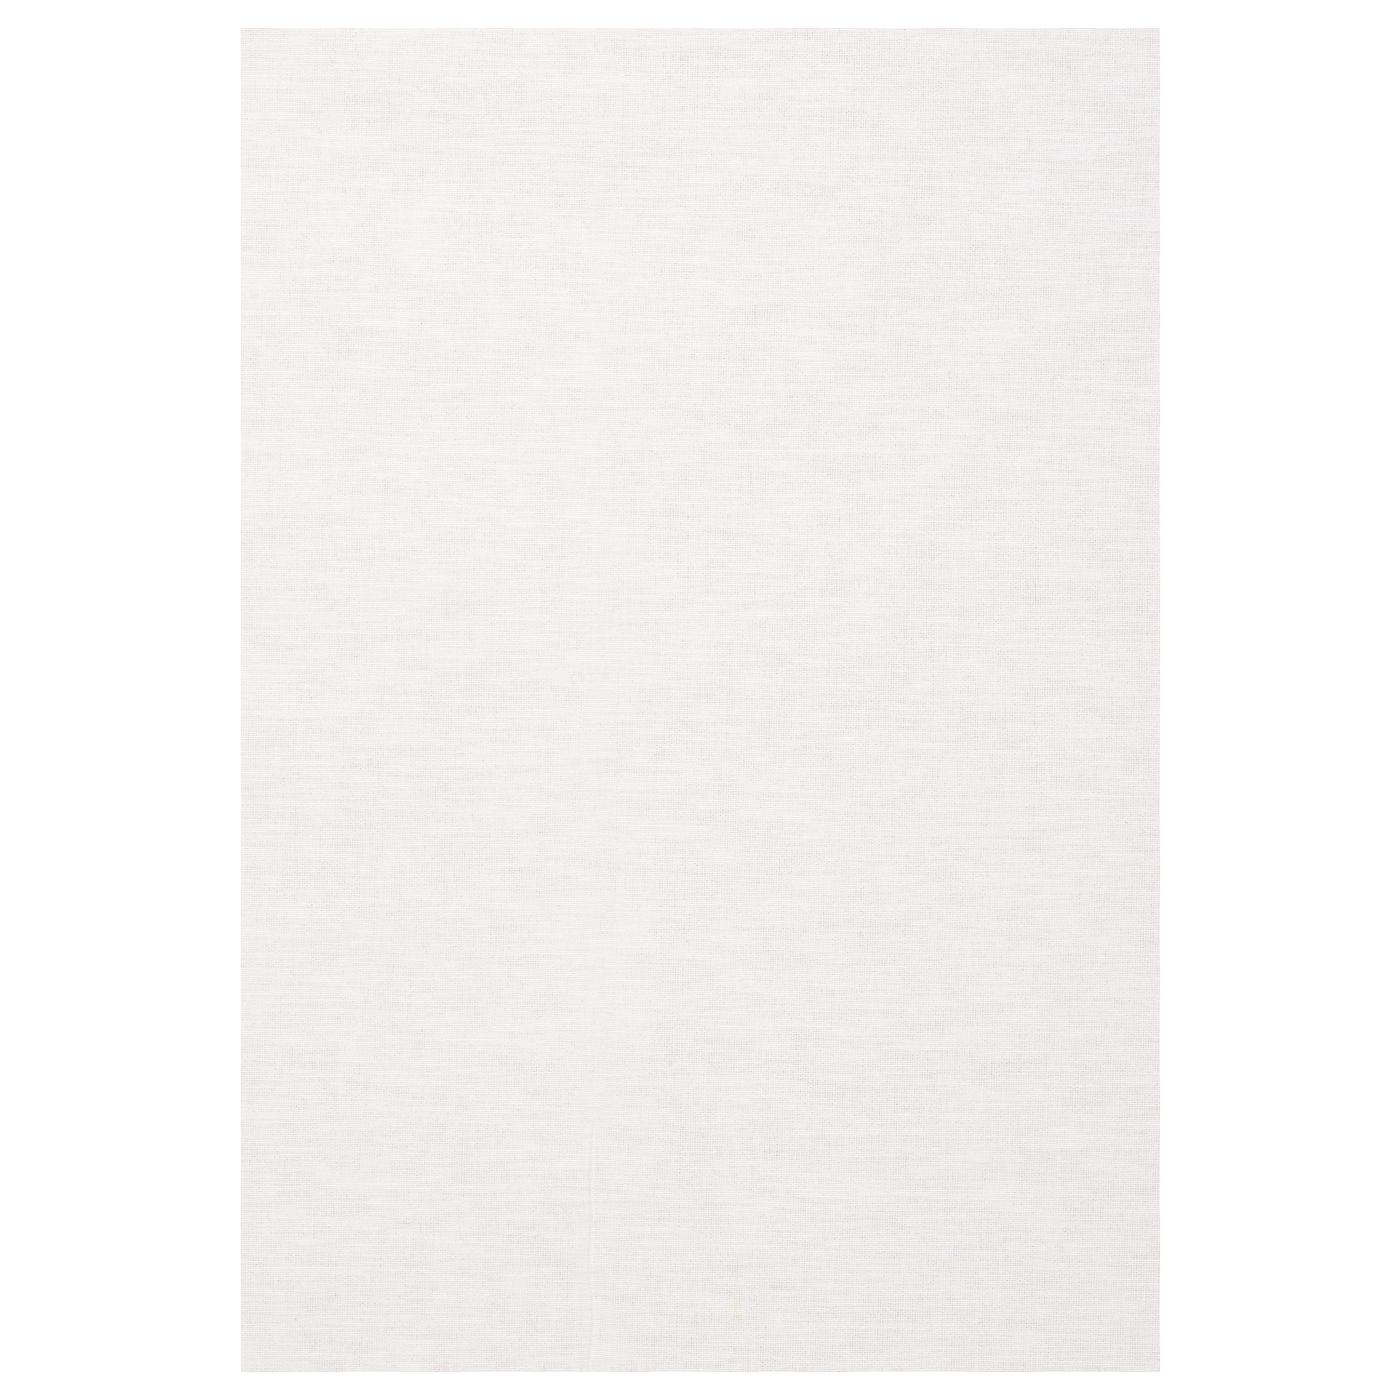 Ikea Rug Felt: LENDA Fabric White 150 Cm